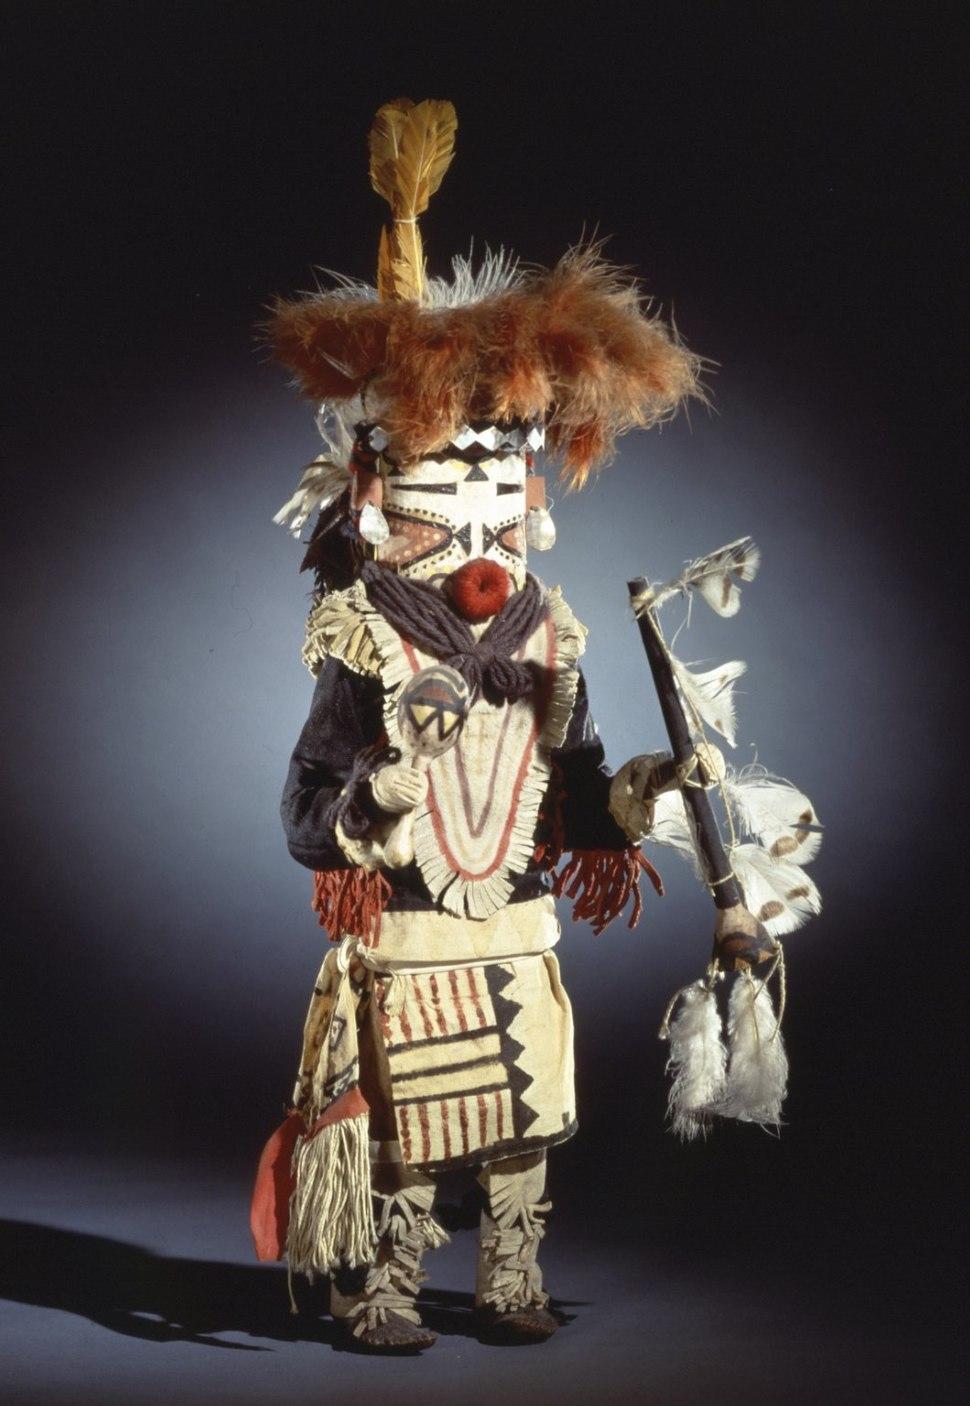 She-we-na (Zuni Pueblo) (Native American). Kachina Doll (Paiyatemu), late 19th century